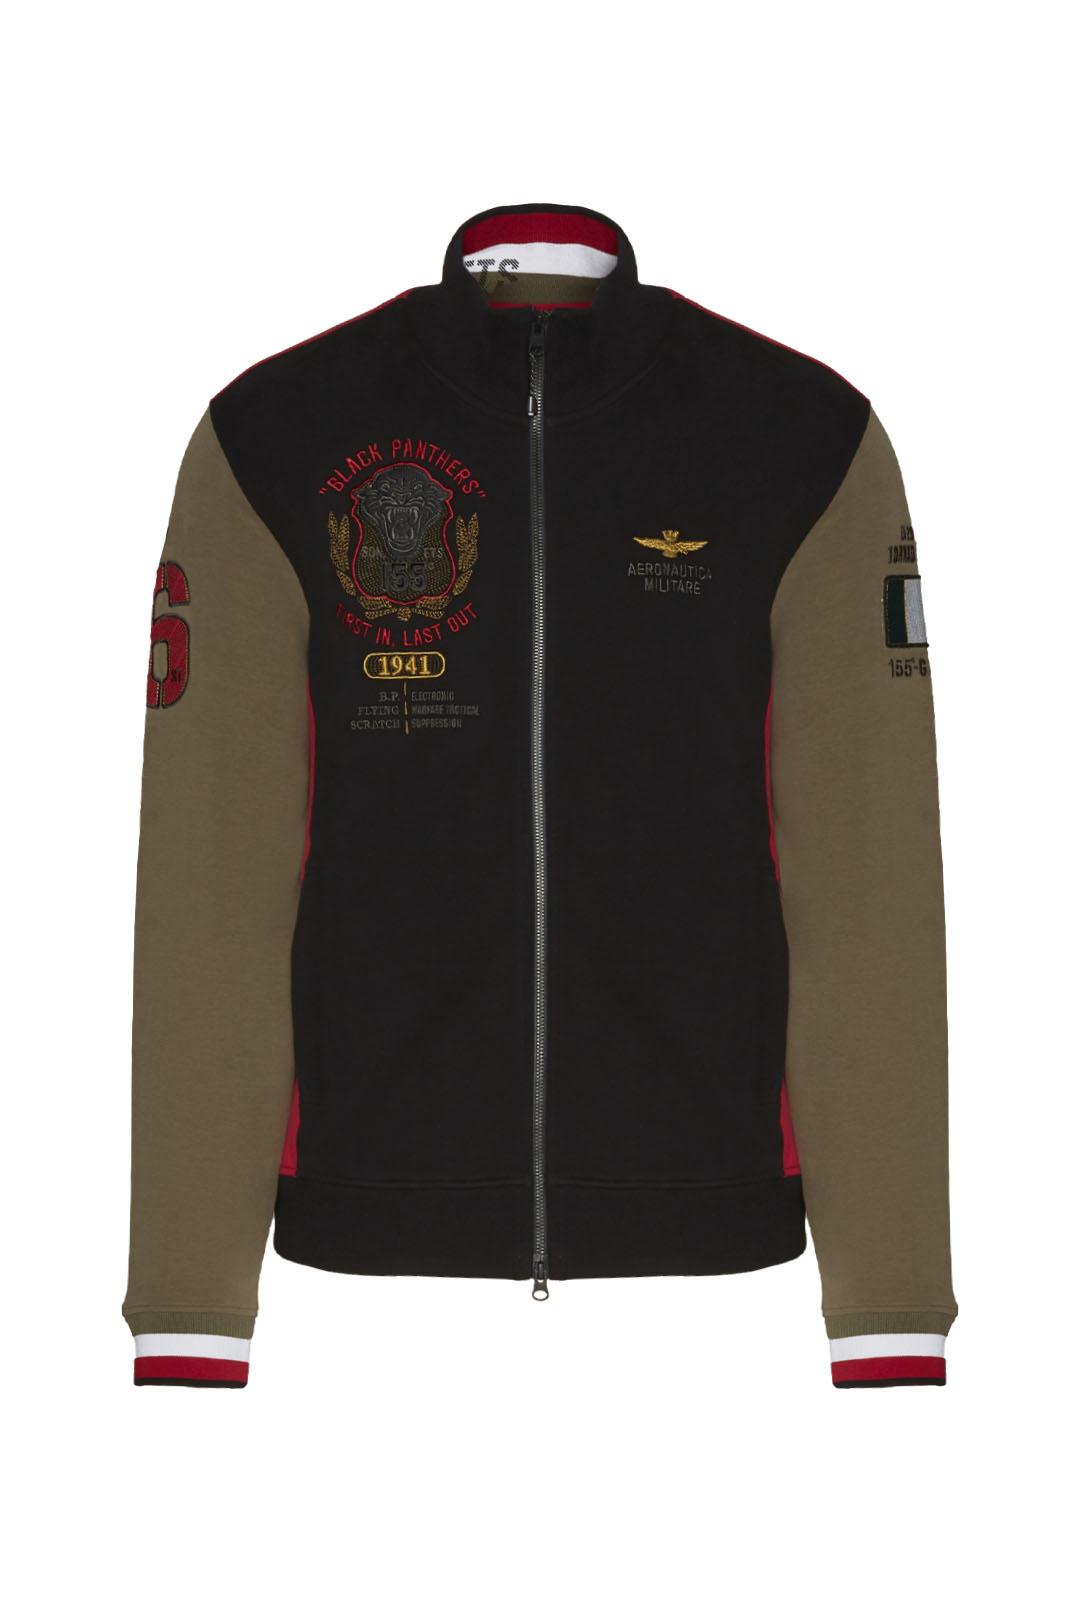 Sweatshirt 155th Group Black Panthers    1